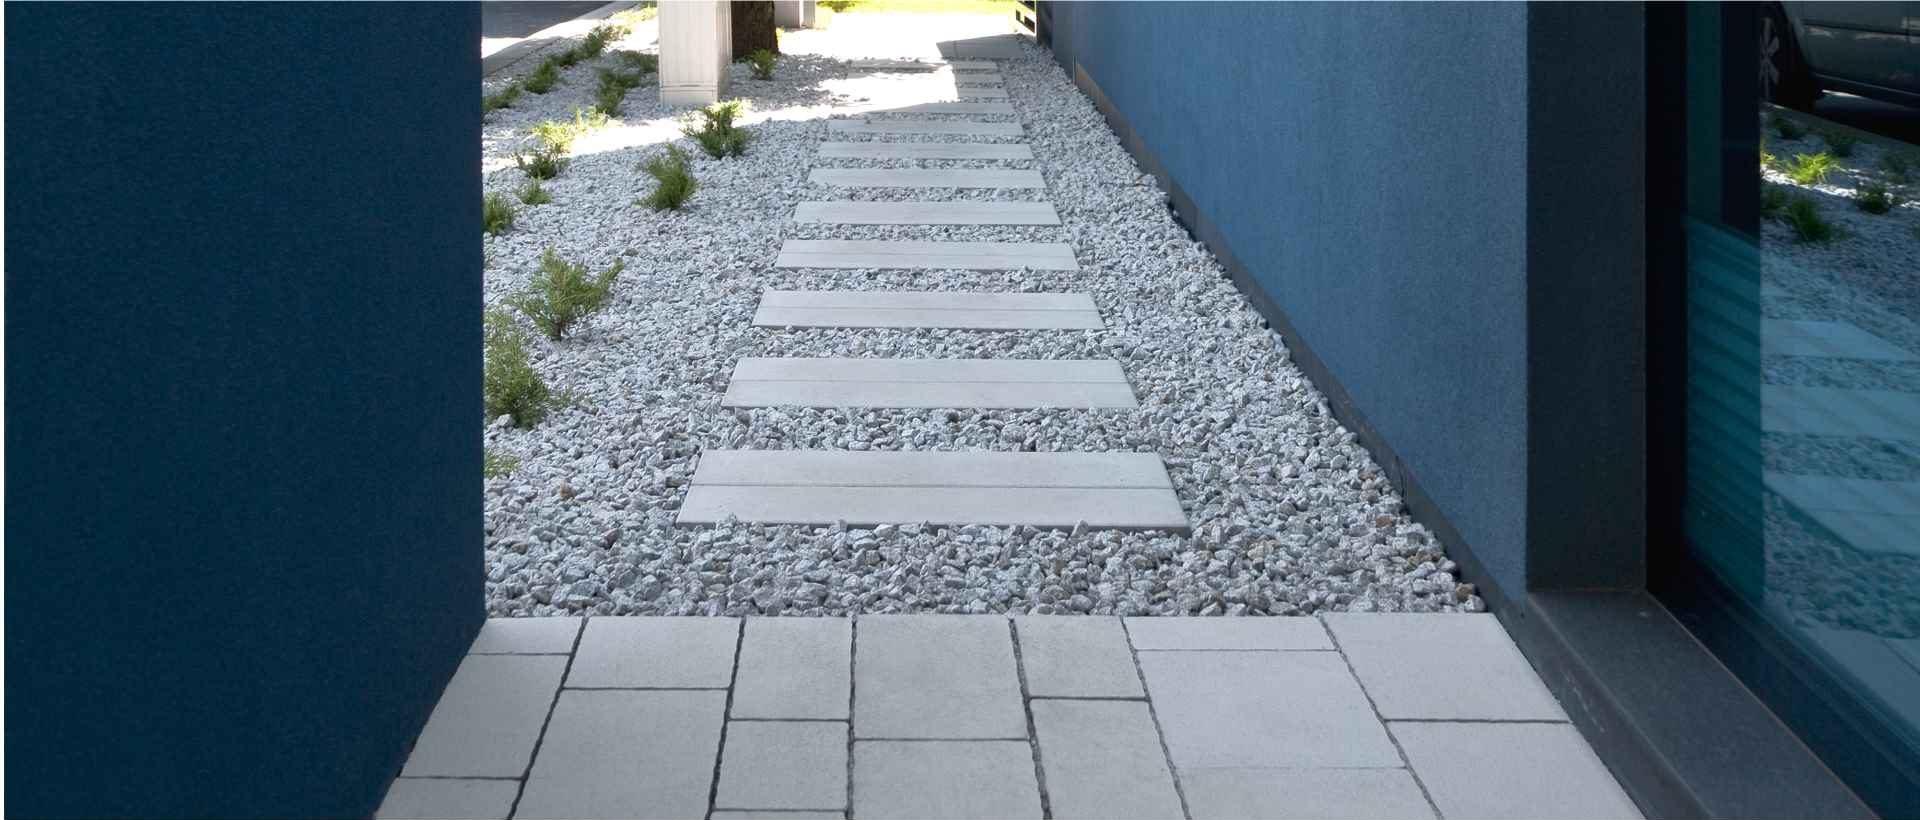 Paving stone Design, Solid slabs, Modern Line